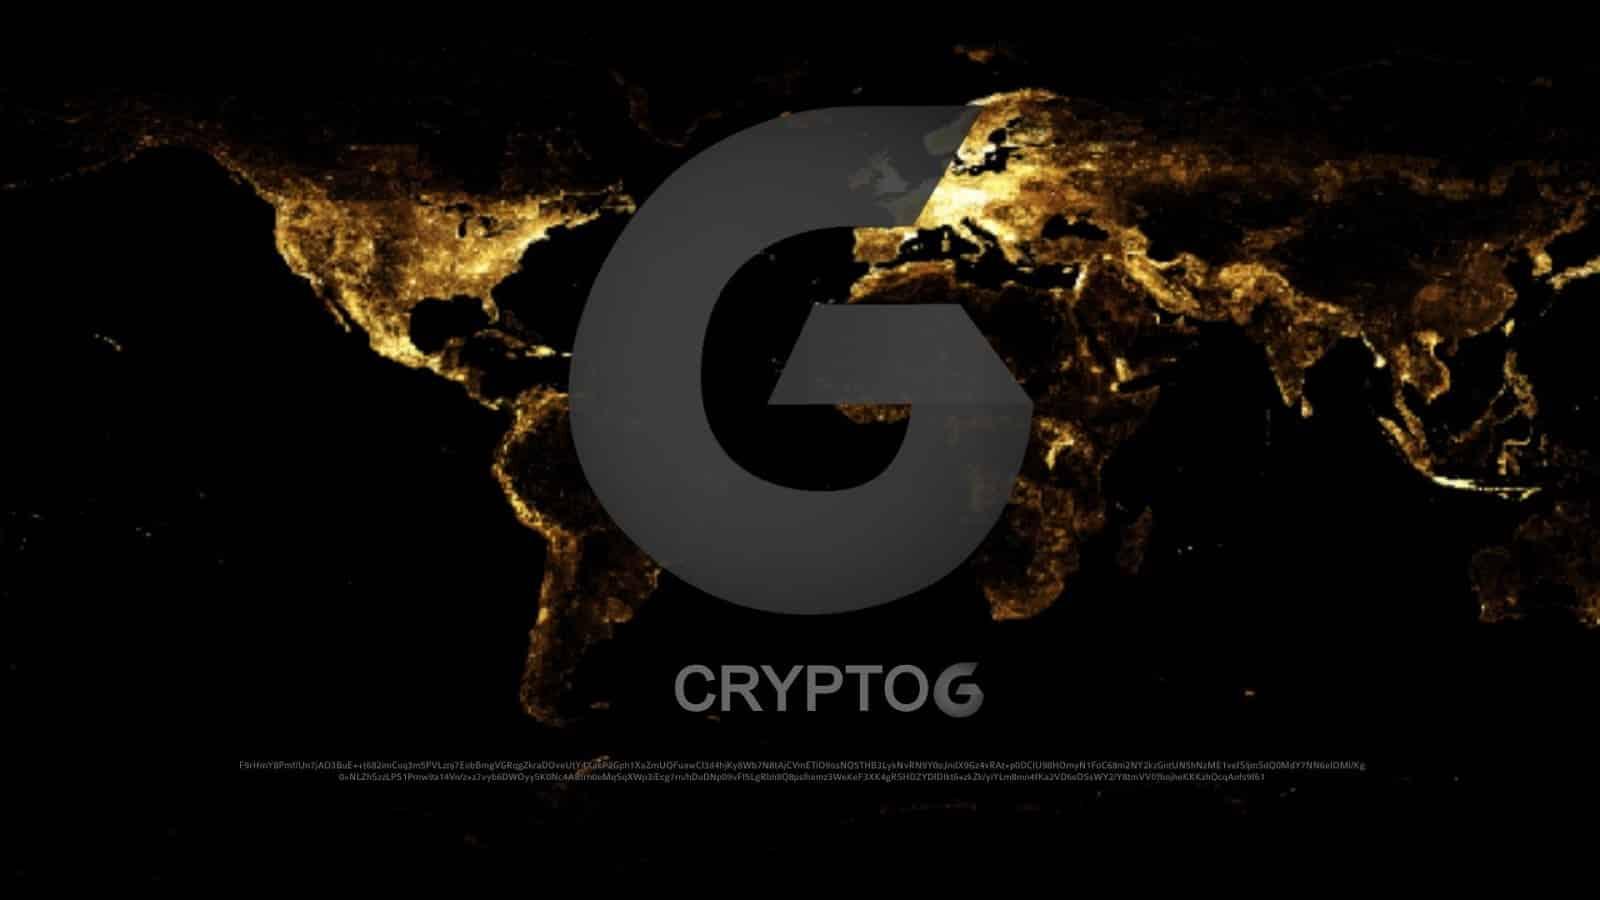 CryptoG